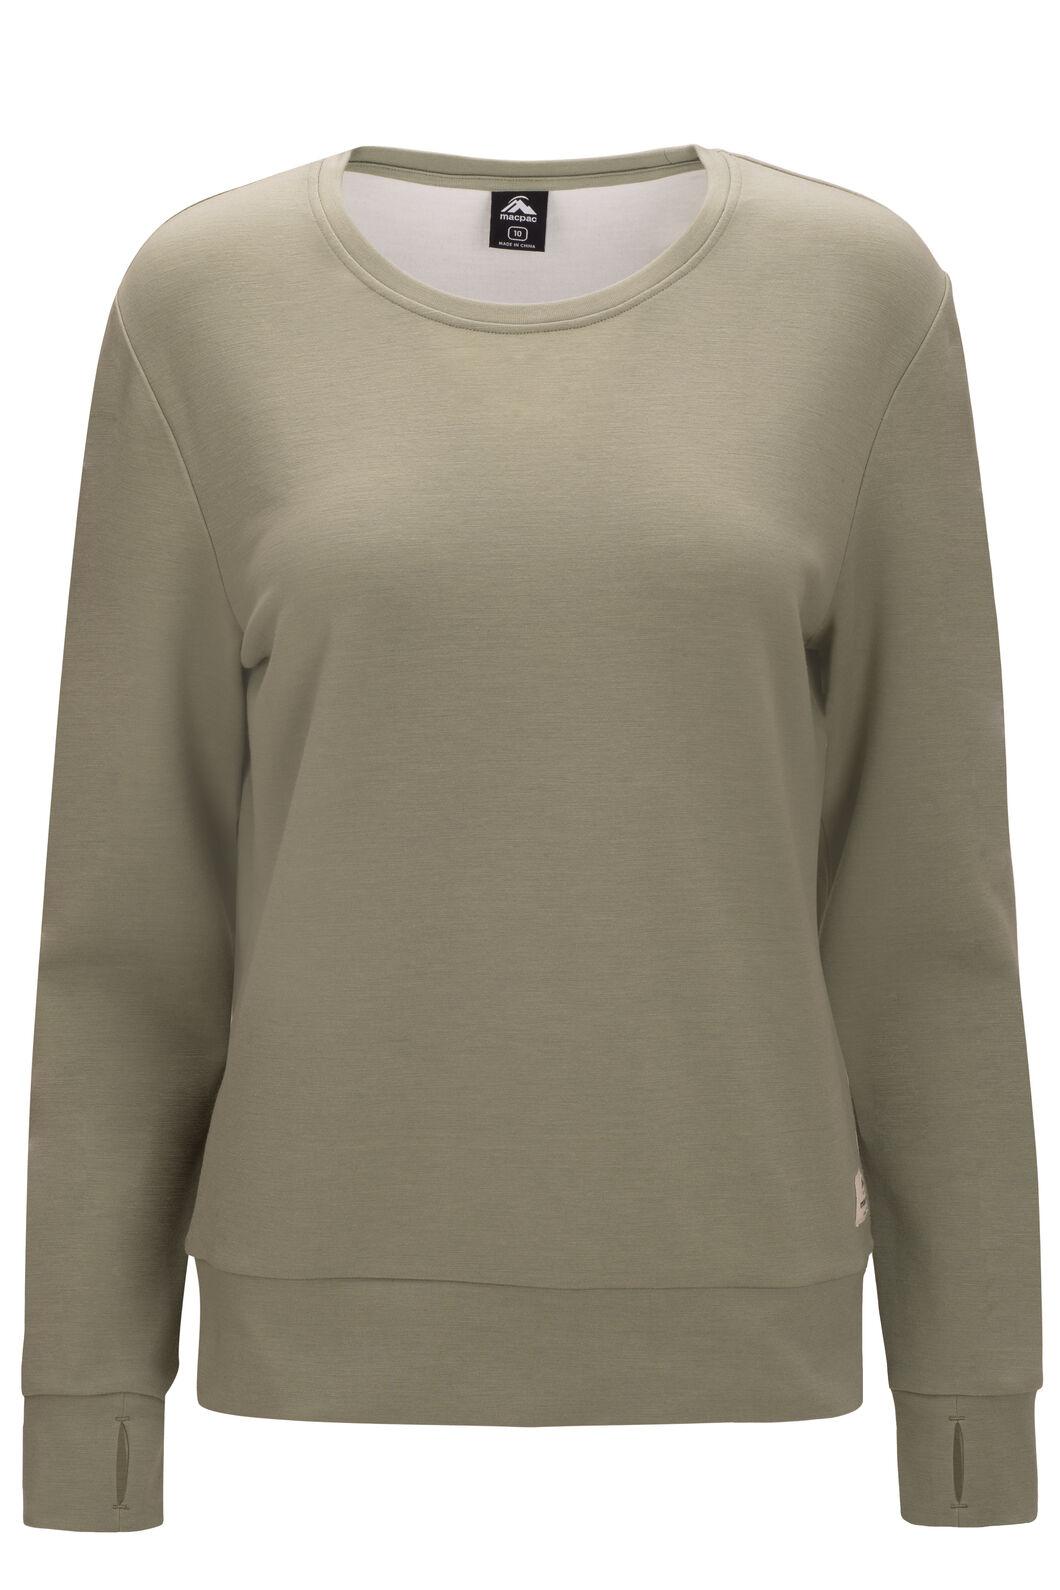 Macpac 280 Merino Long Sleeve Crew — Women's, Oil Green, hi-res